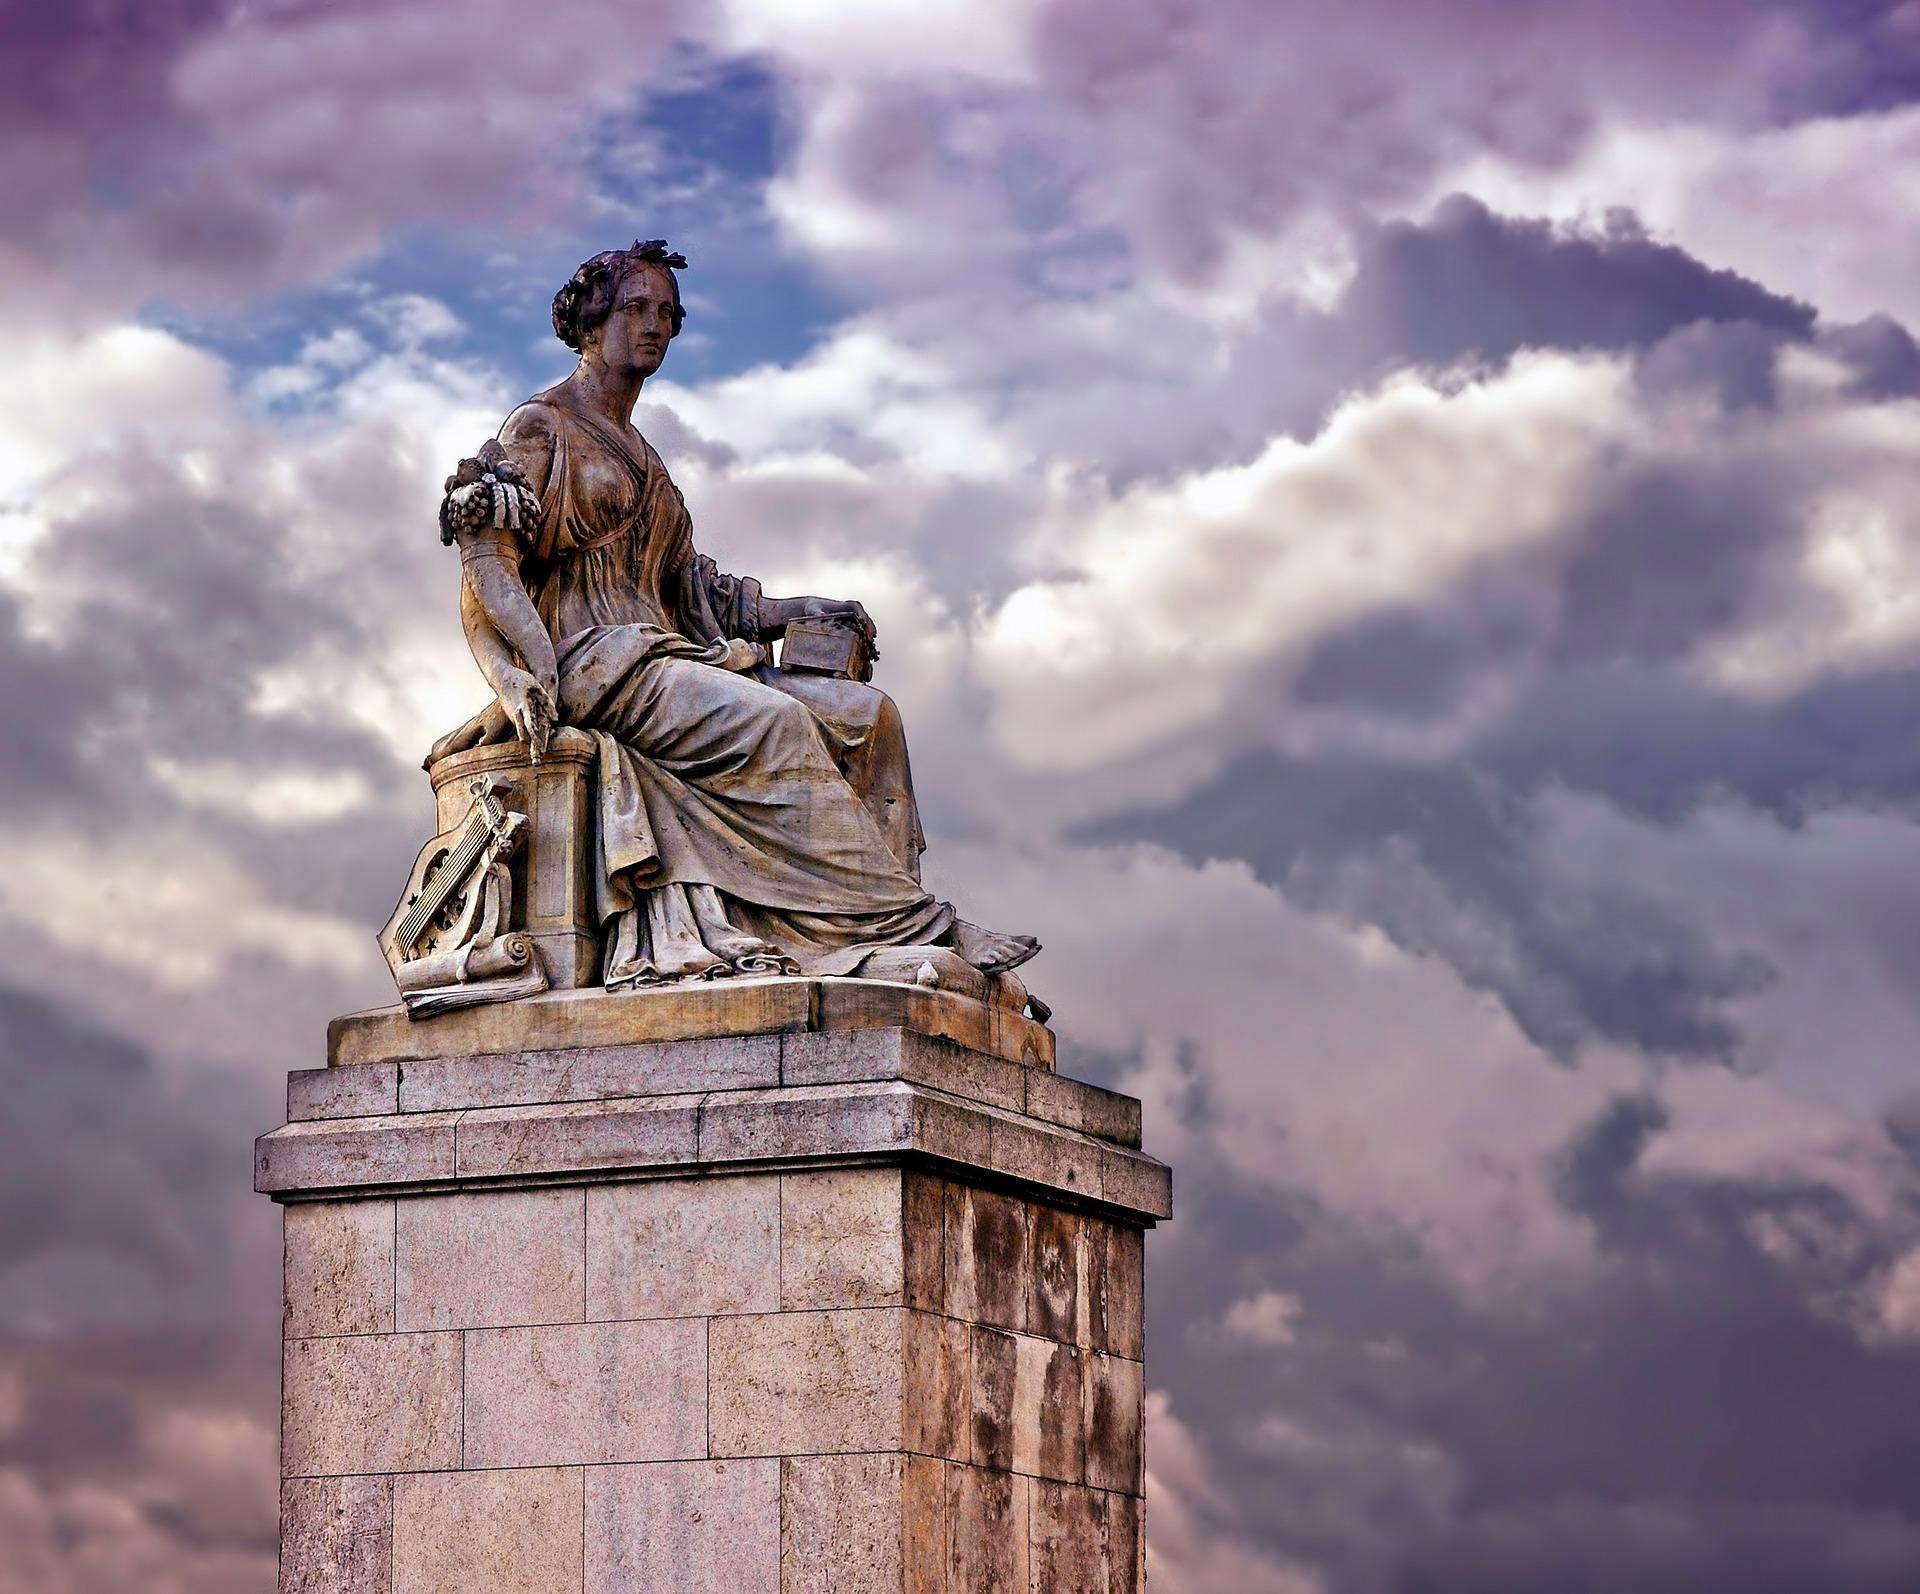 Symbolic view on monument sculpture of Saint Abundantia in Paris, France